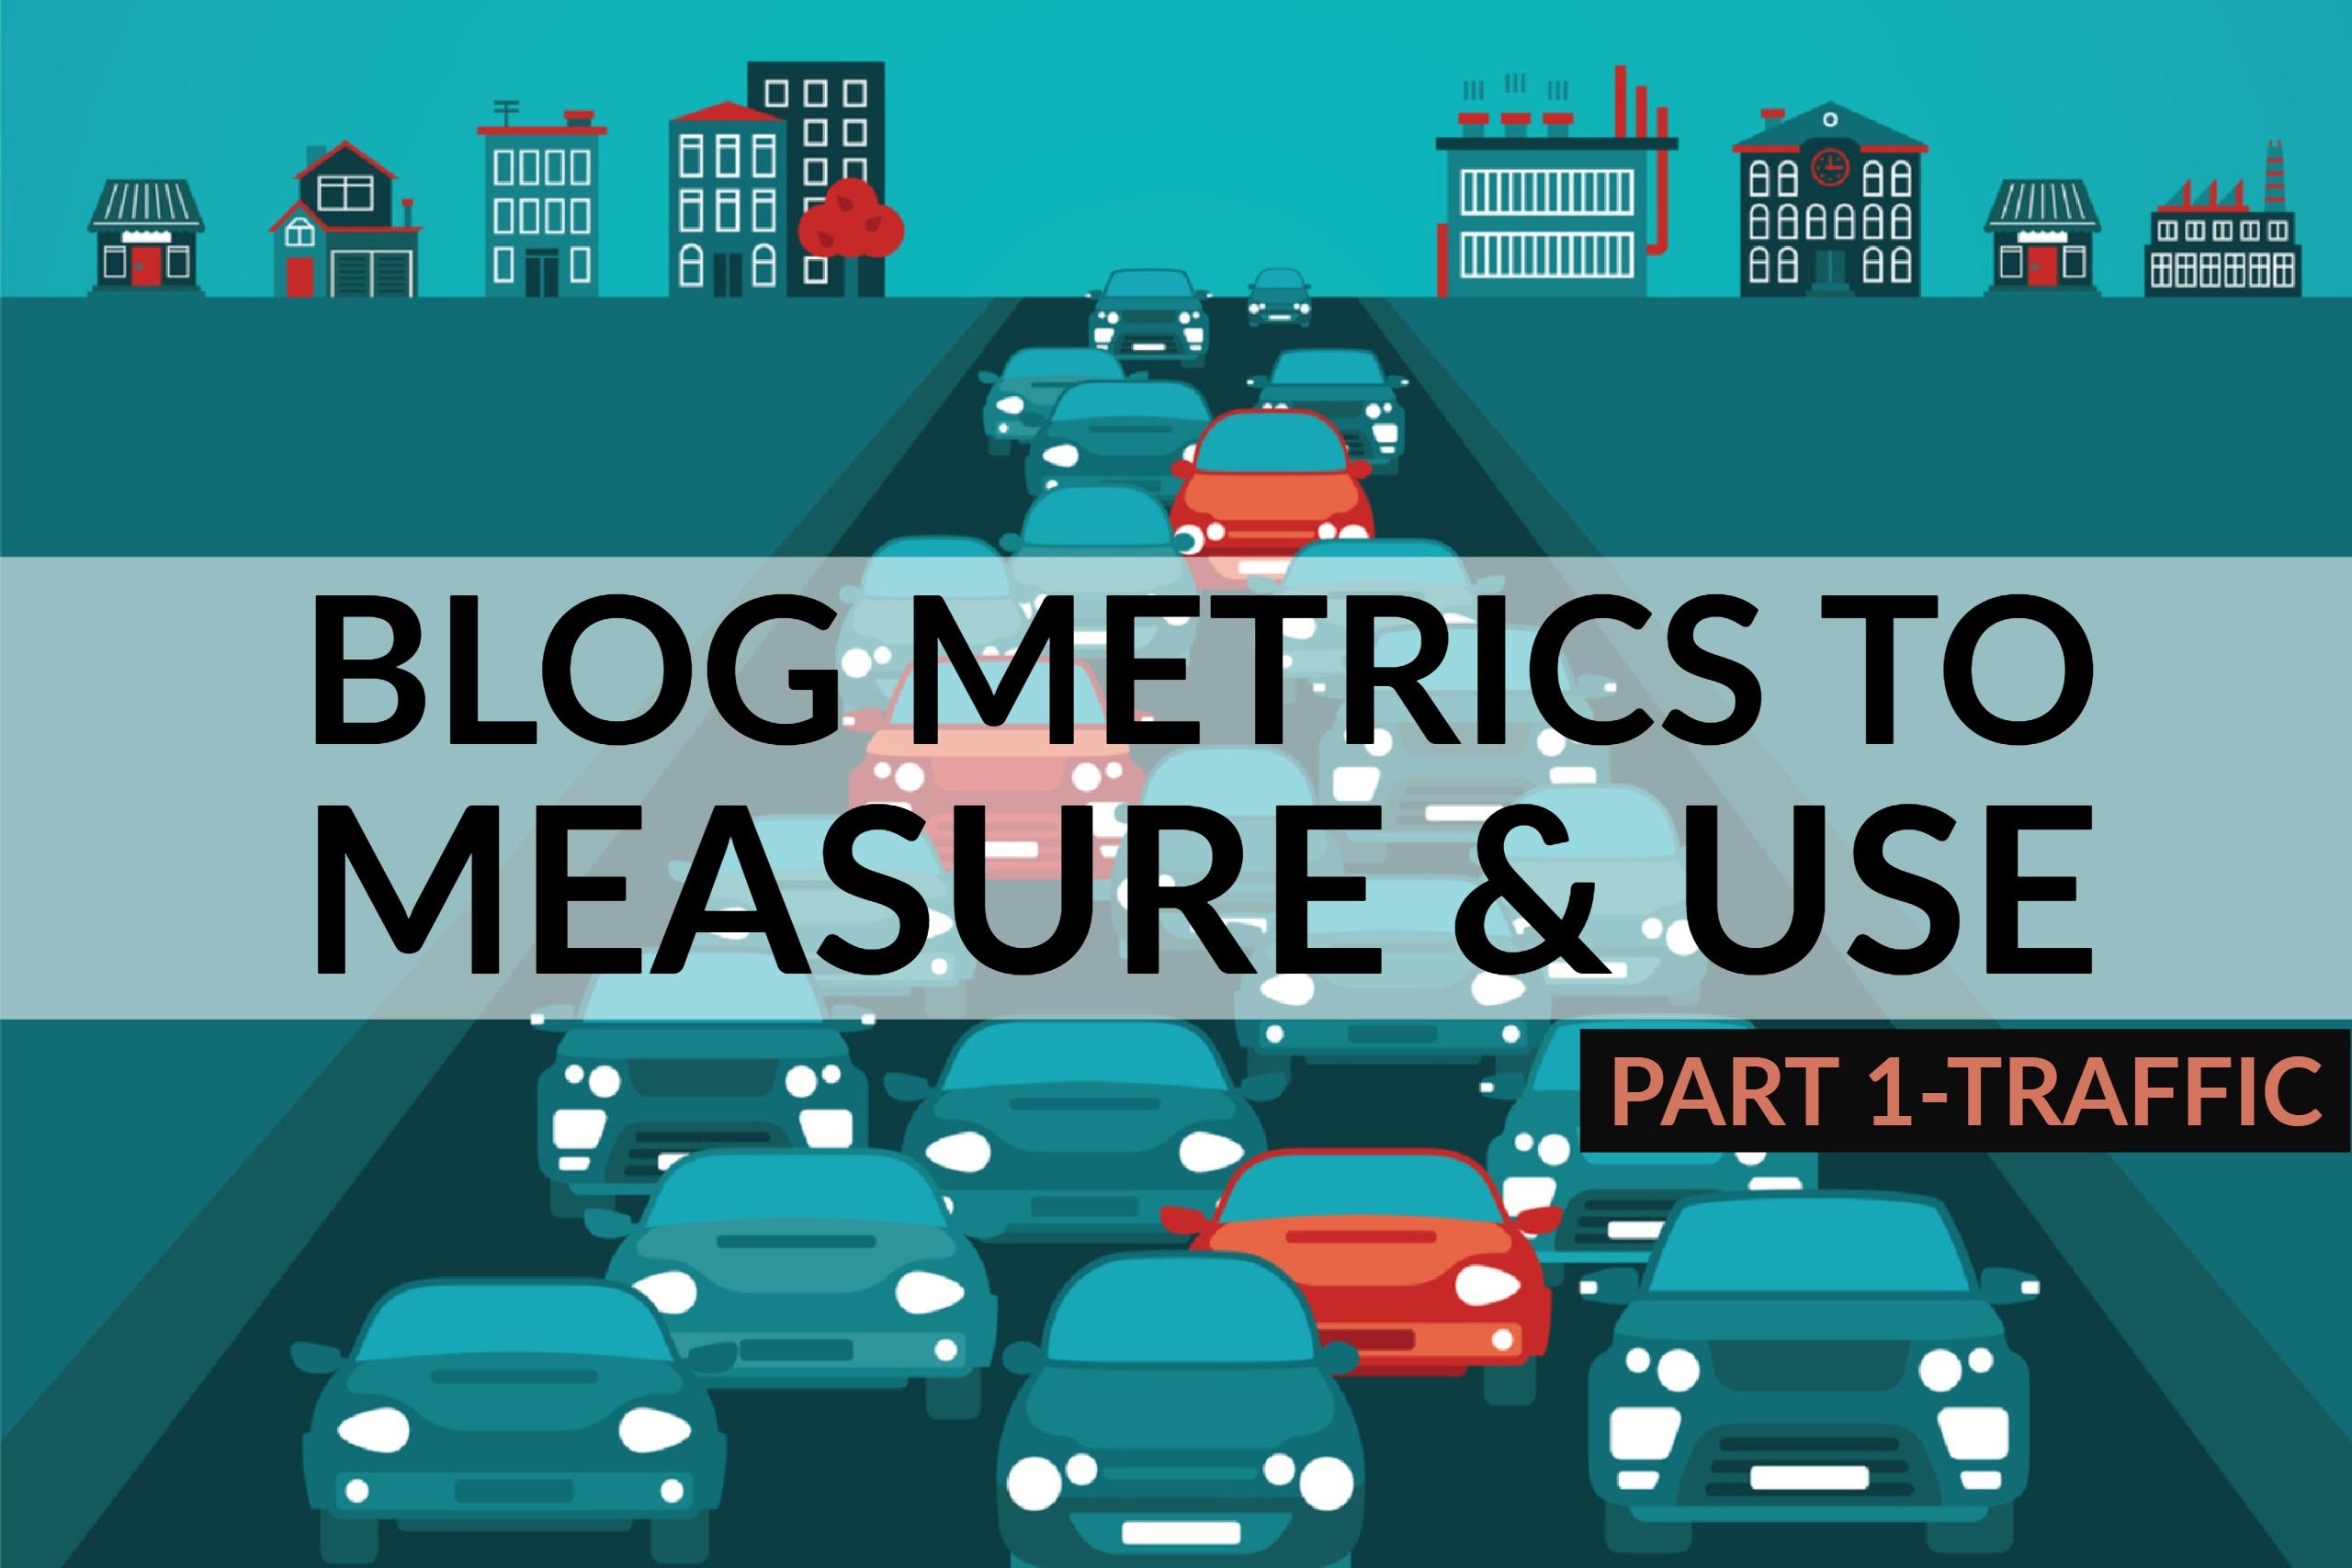 4.12 Blog Metrics to Measure & Use (Part 1-Traffic)